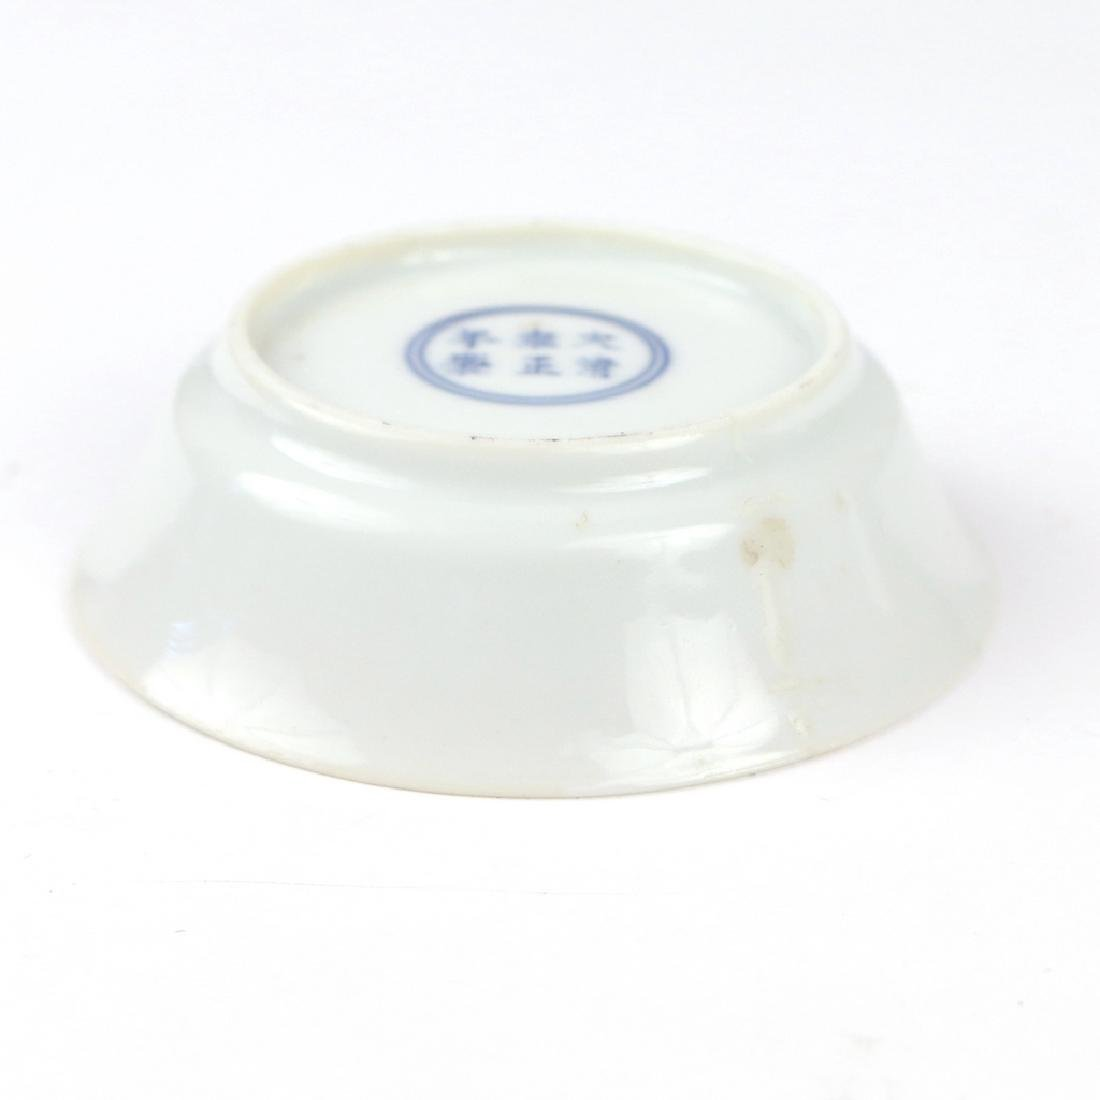 CHINESE ENAMEL PORCELAIN SAUCER - 6